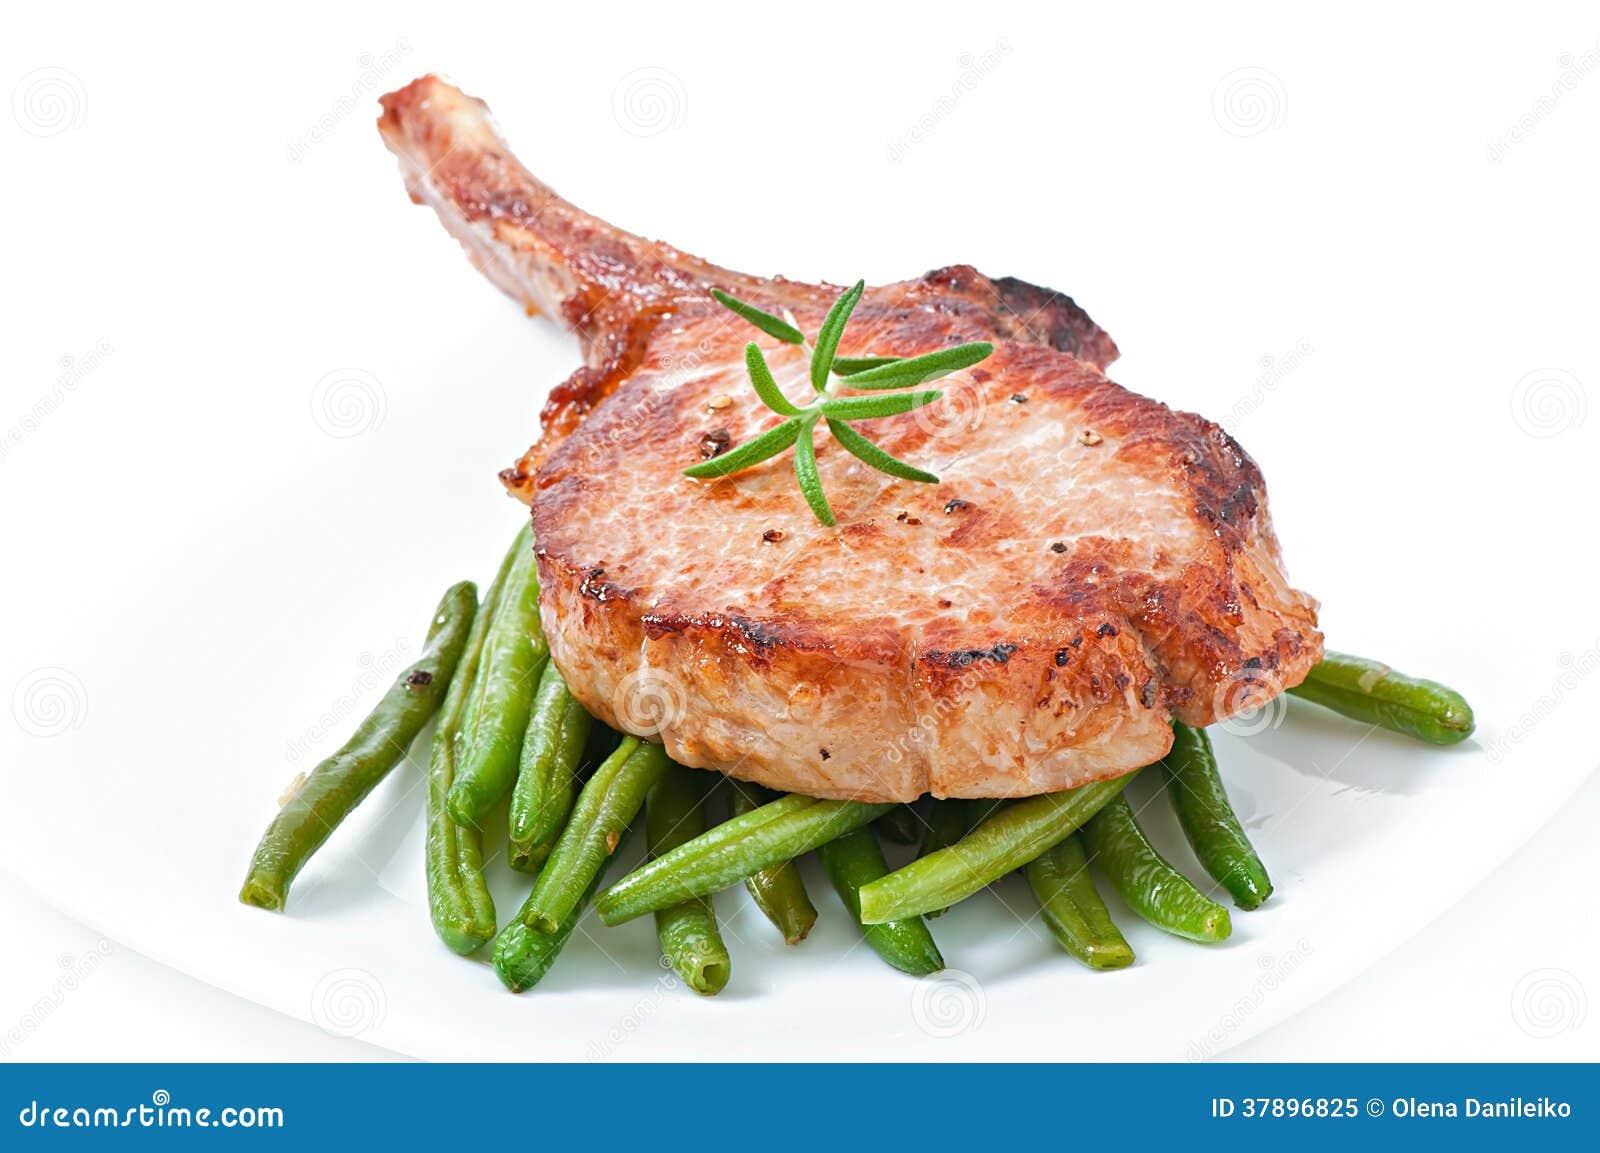 Het geroosterde lapje vlees van de varkensvleesfilet